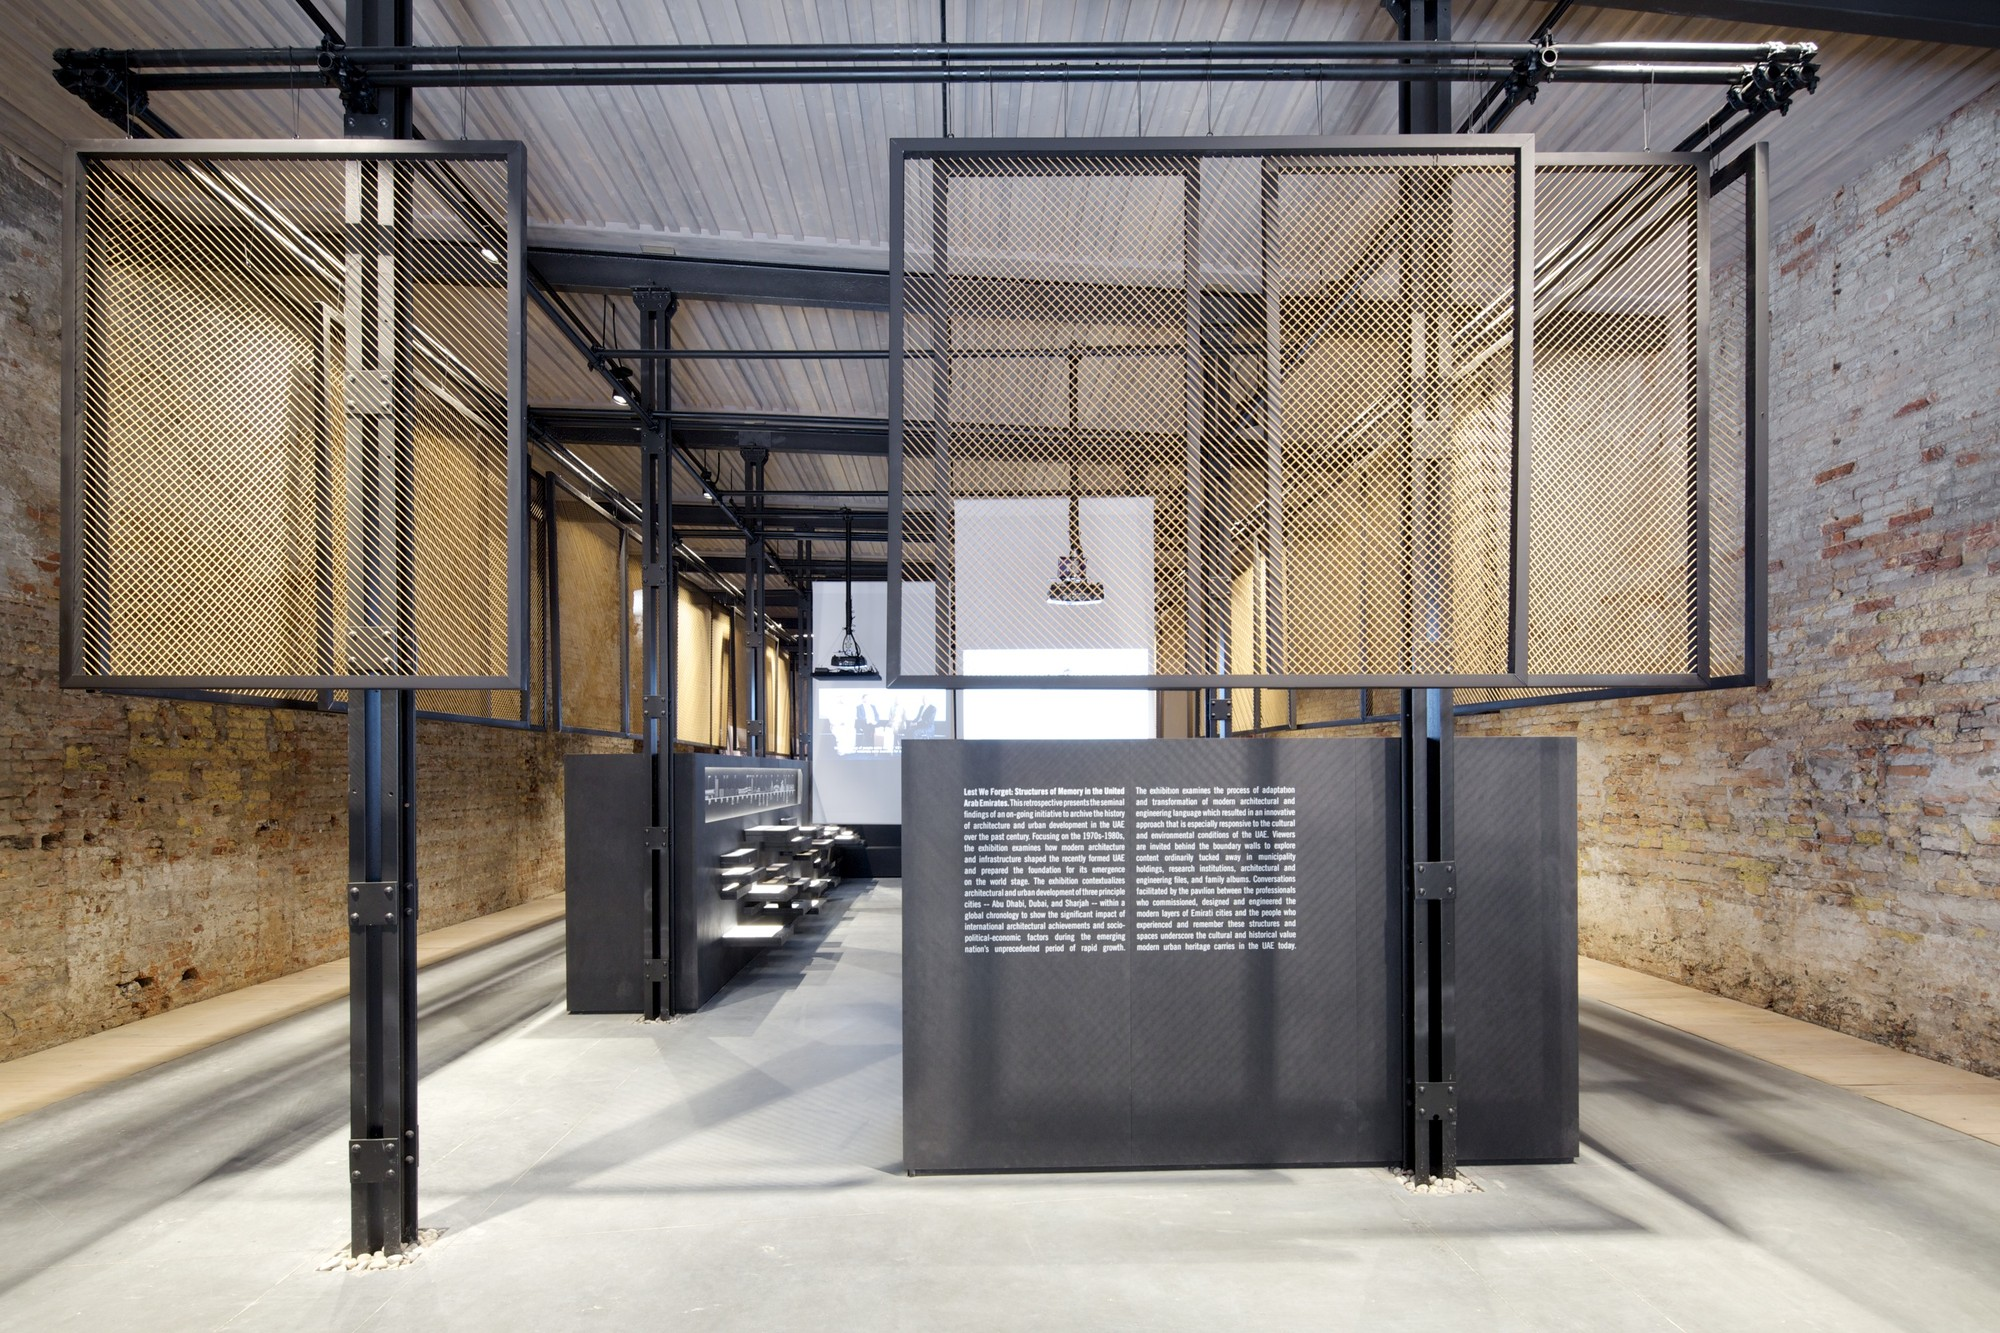 """Lest We Forget"" - UAE's Pavilion at the Venice Biennale 2014, © Nico Saieh"